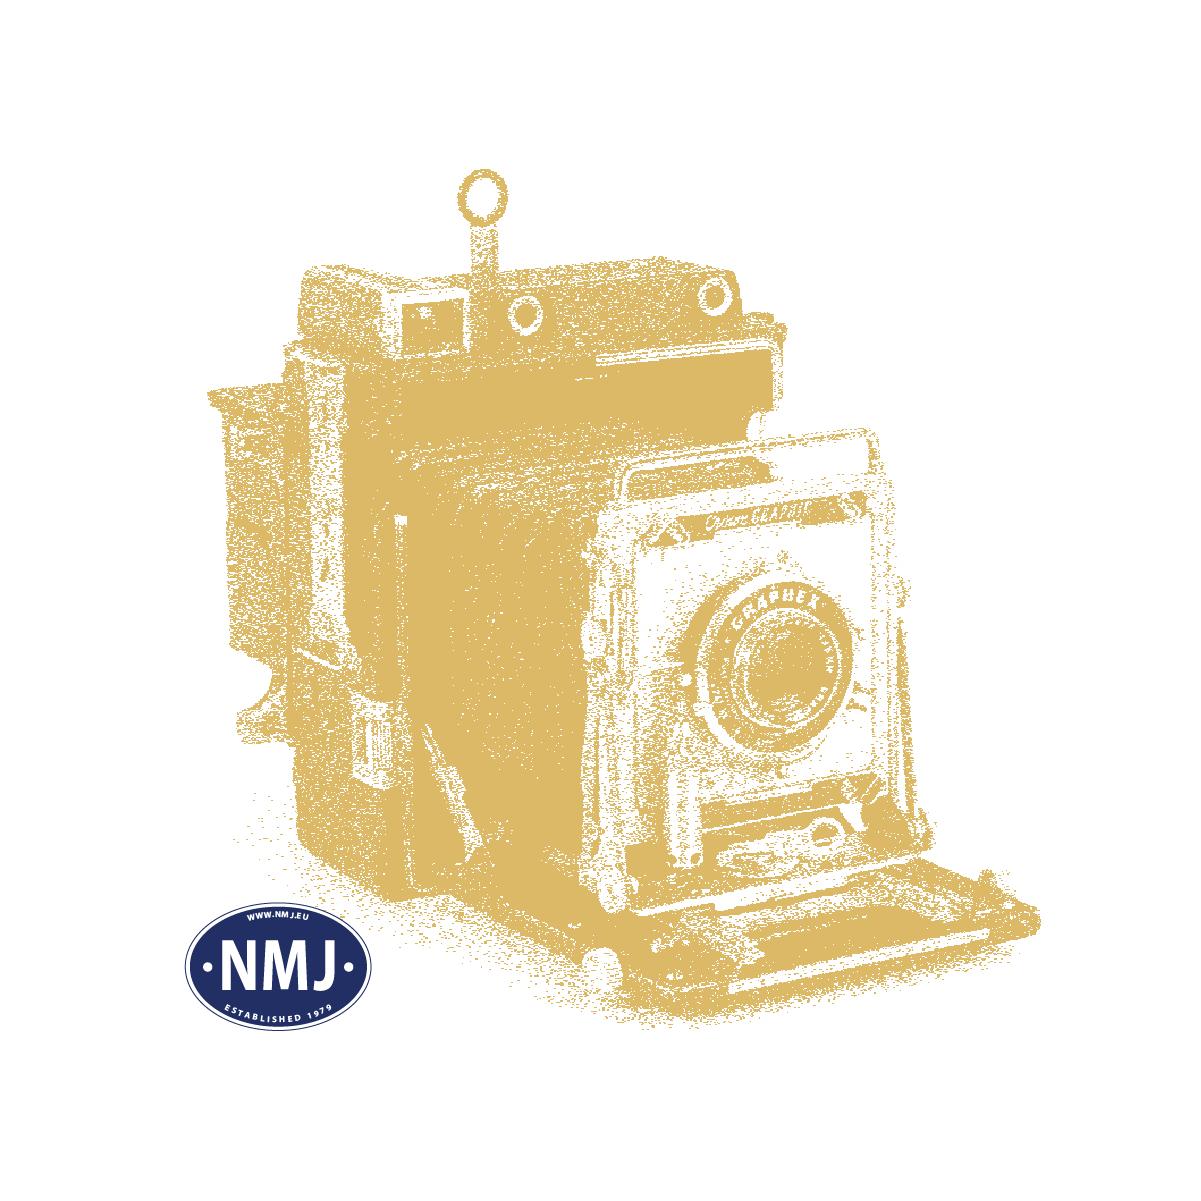 Topline Lokomotiver, nmj-topline-93109-cargonet-el14-2184-dc, NMJT93109